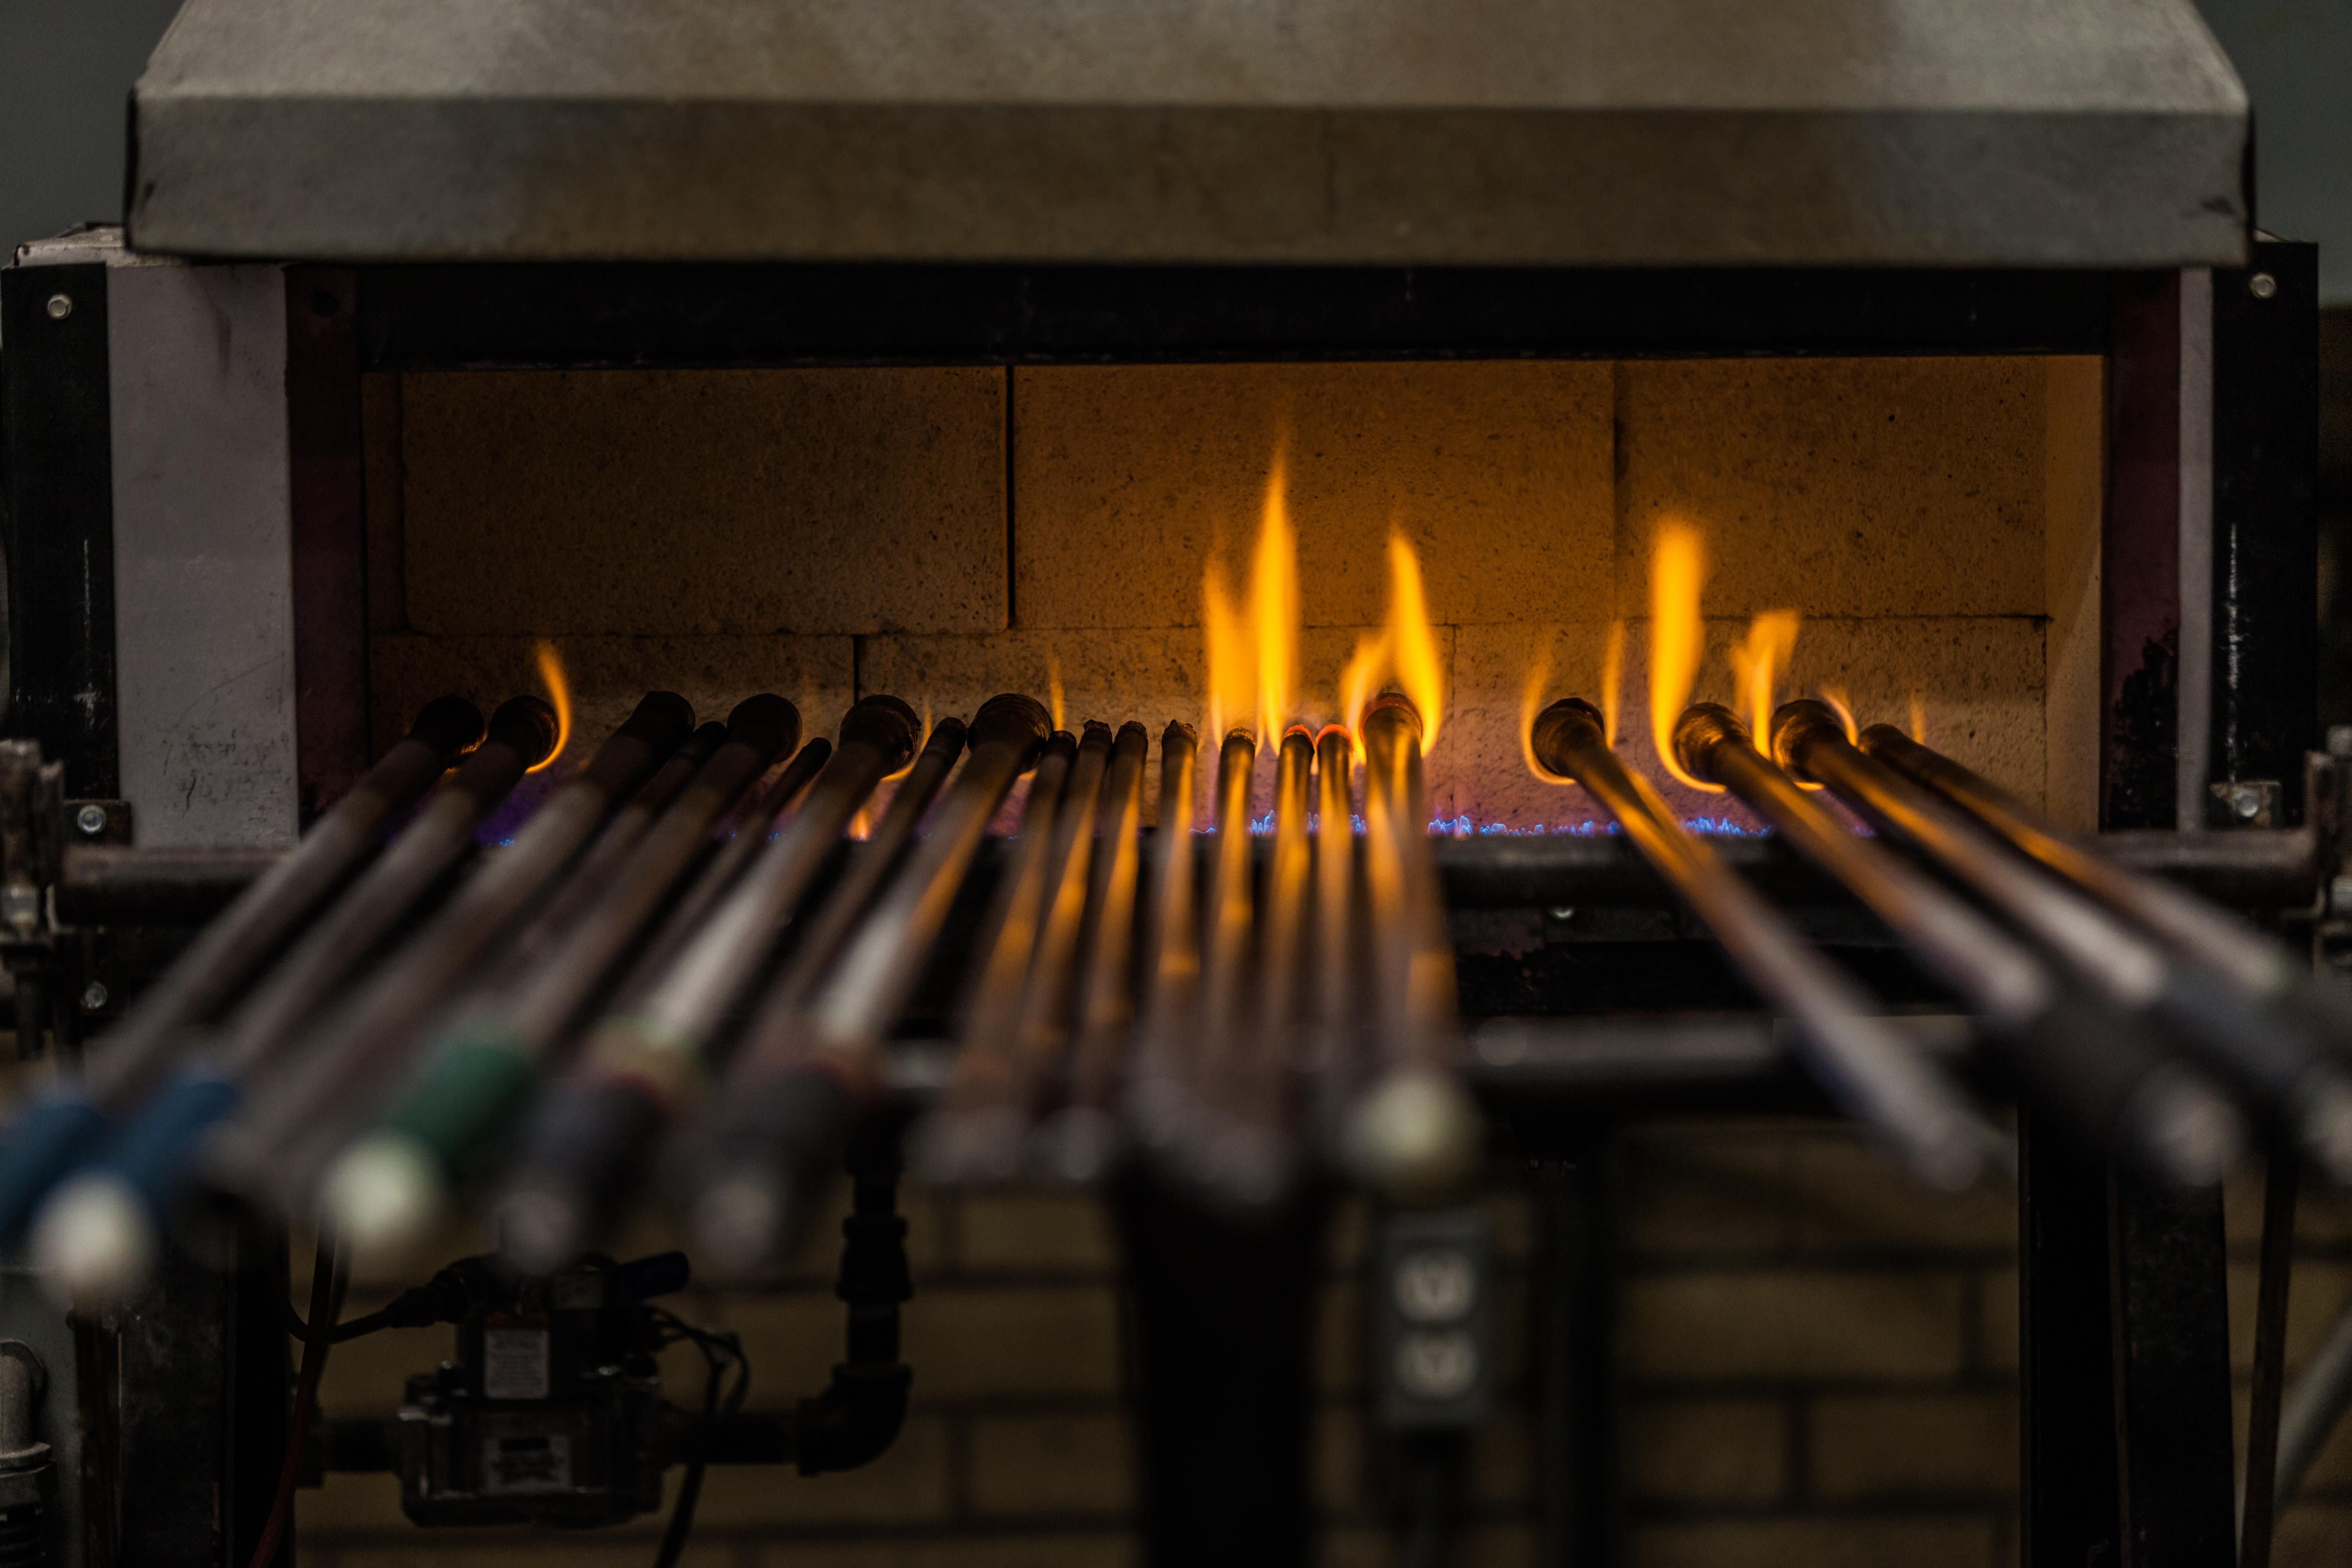 https://watt.co.uk/wp-content/uploads/2020/04/blowing-pipes-kept-warm-in-the-propane-oven-PTTSQK9.jpg